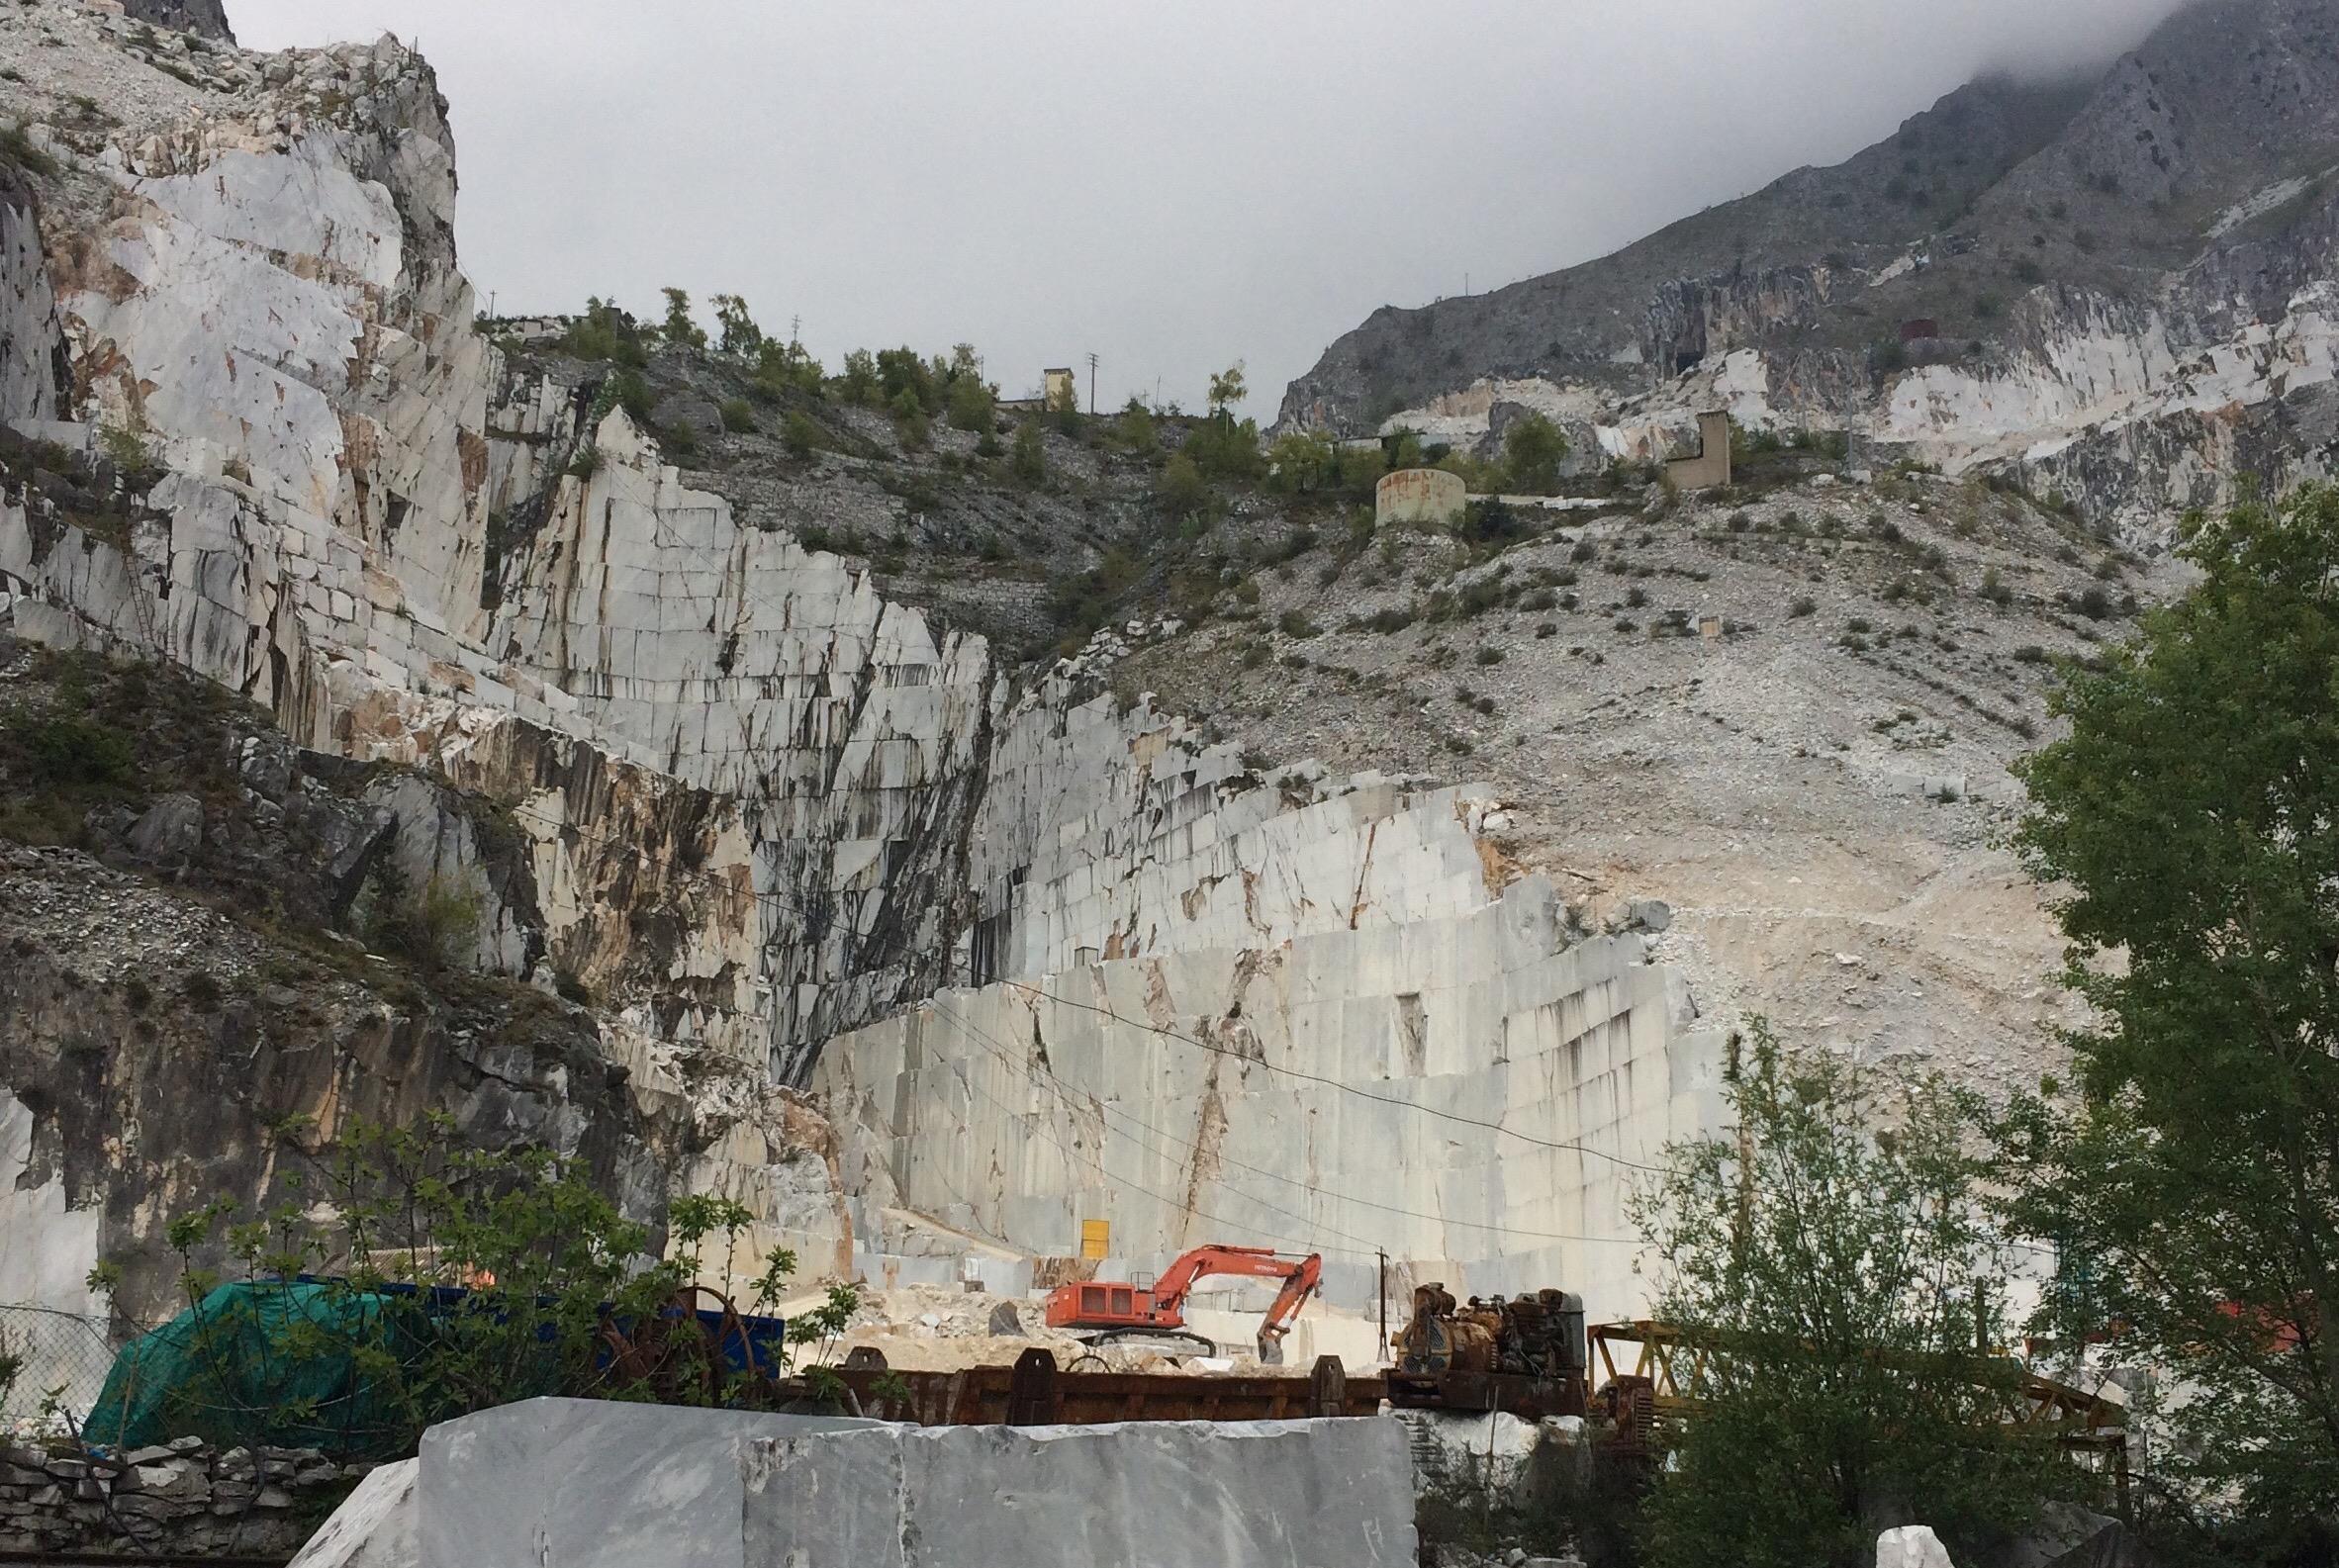 Carrara Marble Quarries Fantiscritti open cast mines